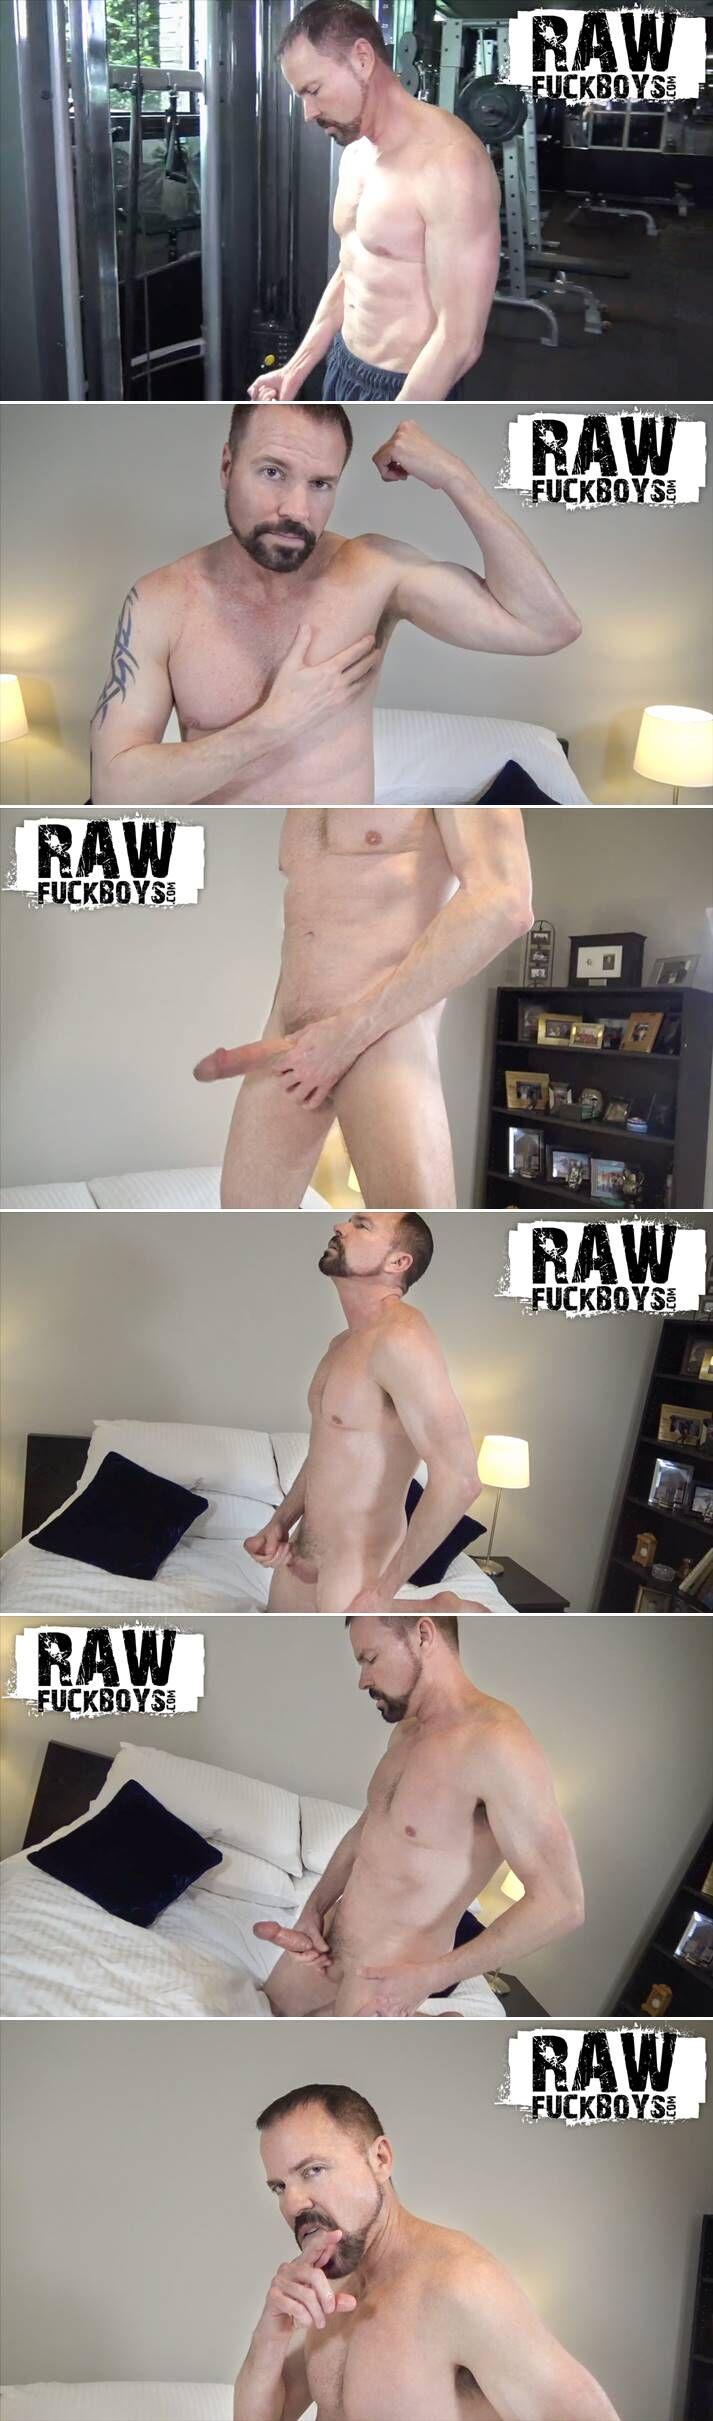 Jason Sparks Solo - Raw Fuck boys